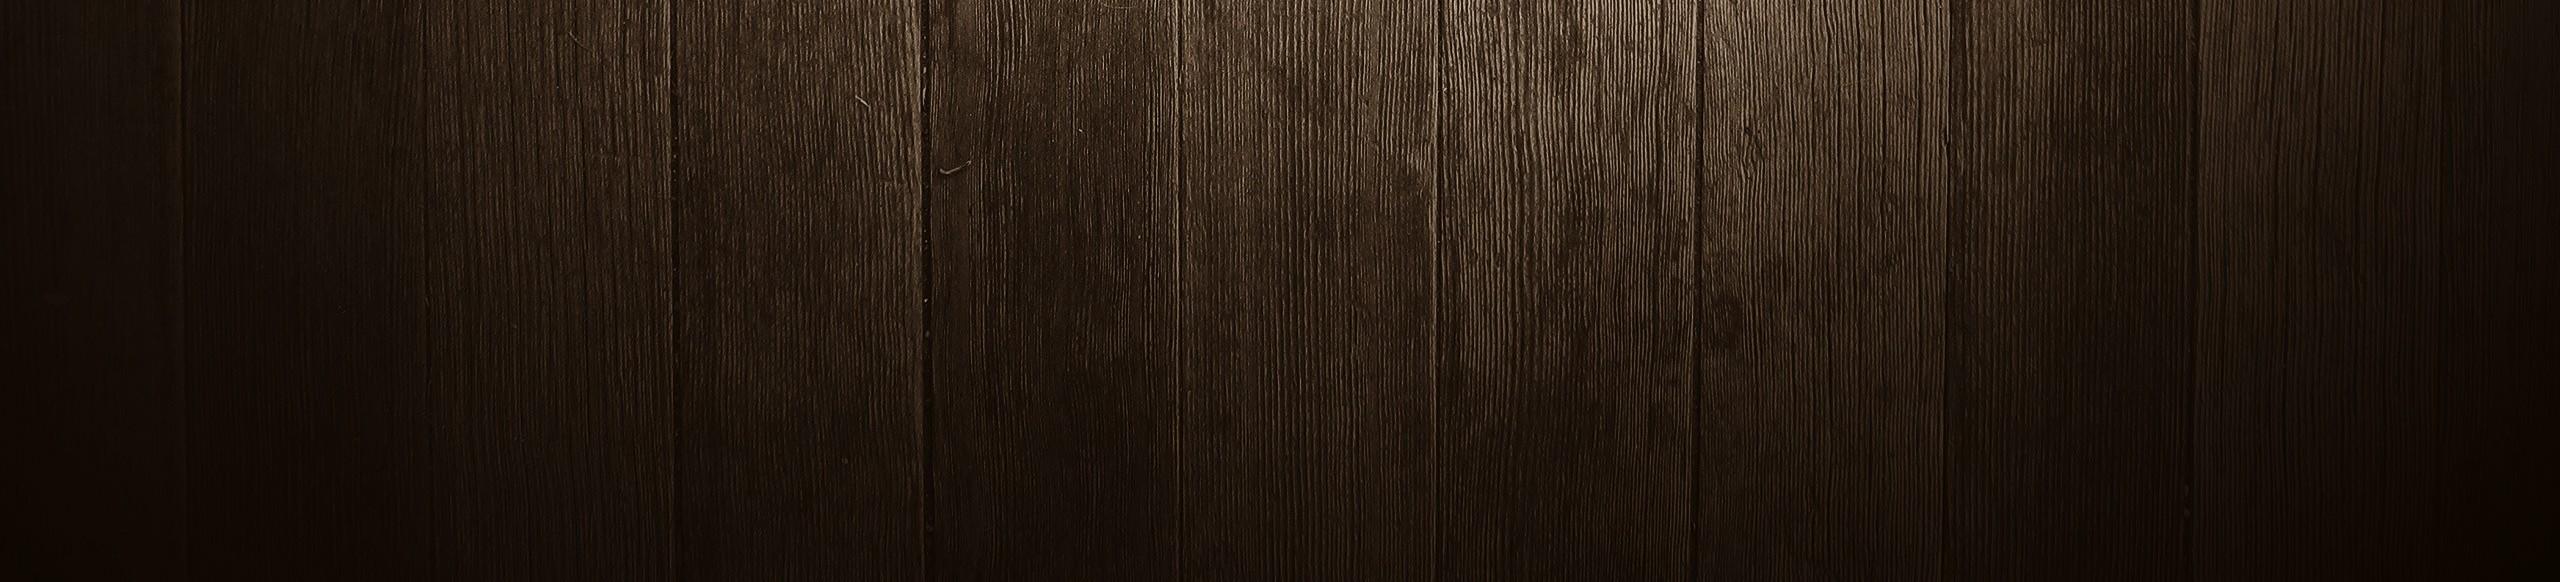 fresno_wood_wood_texture